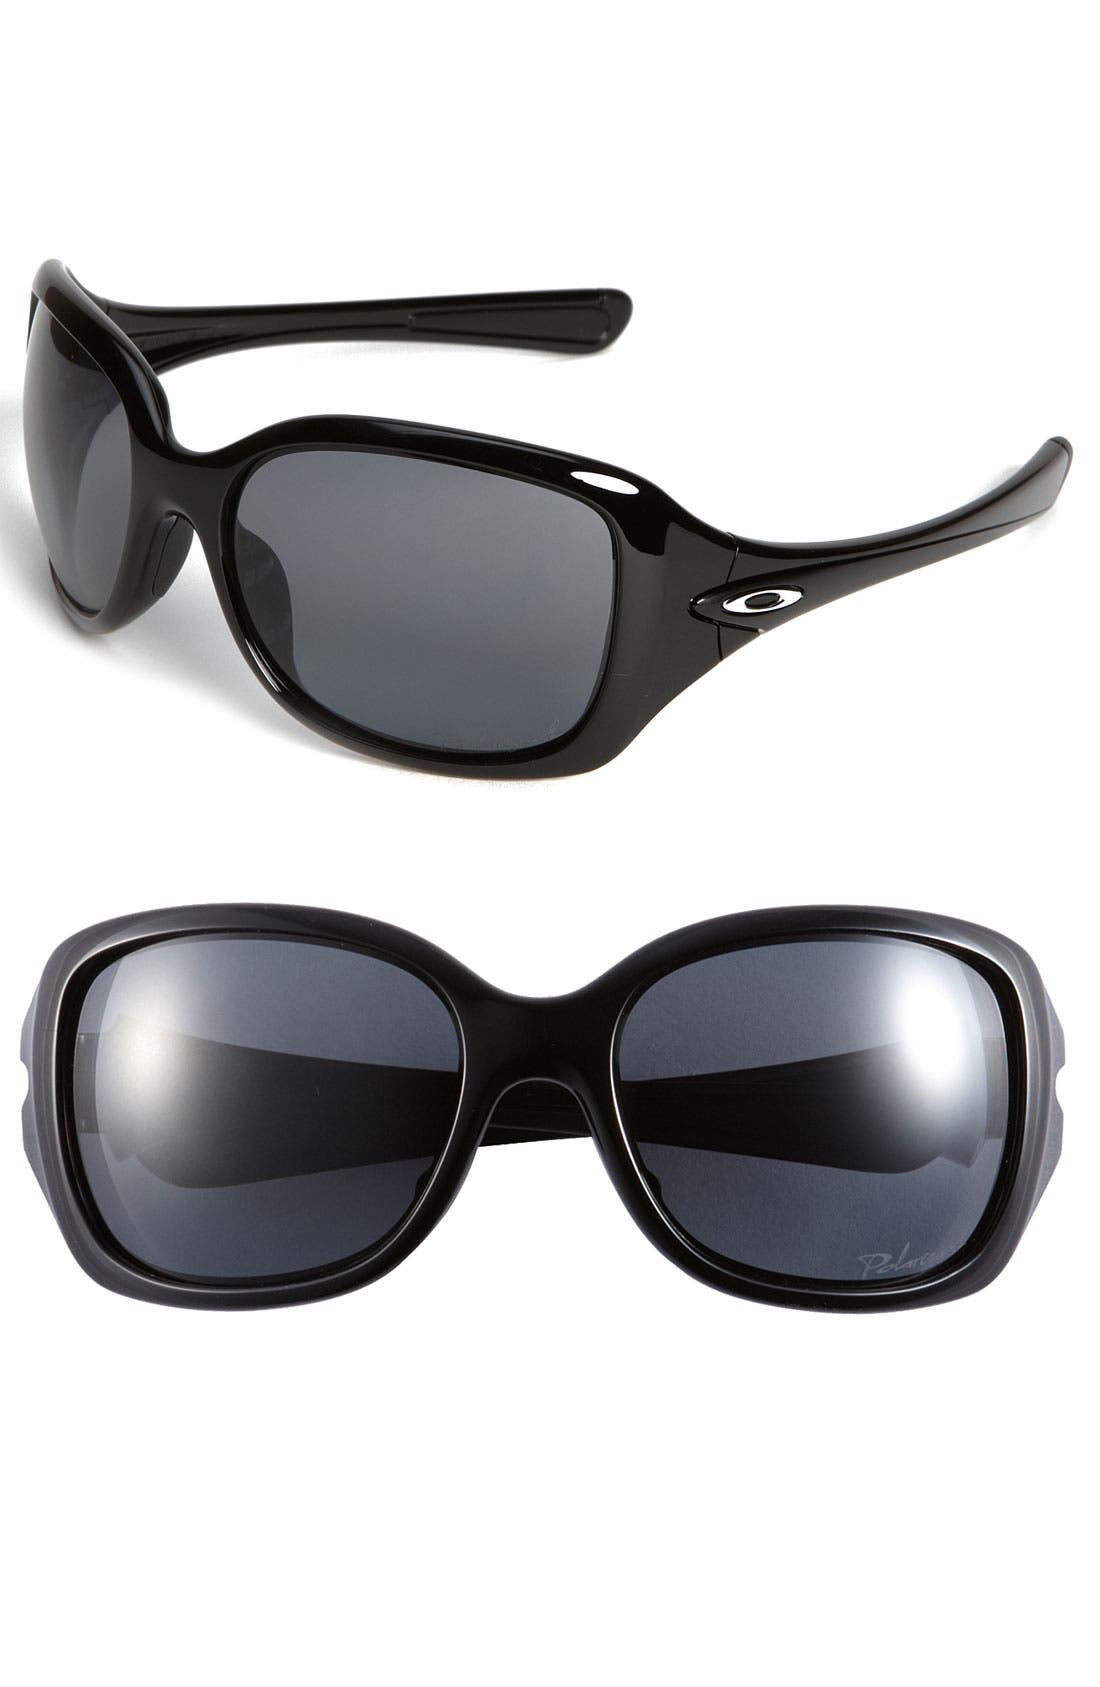 Main Image - Oakley 'Necessity™' Polarized Sunglasses